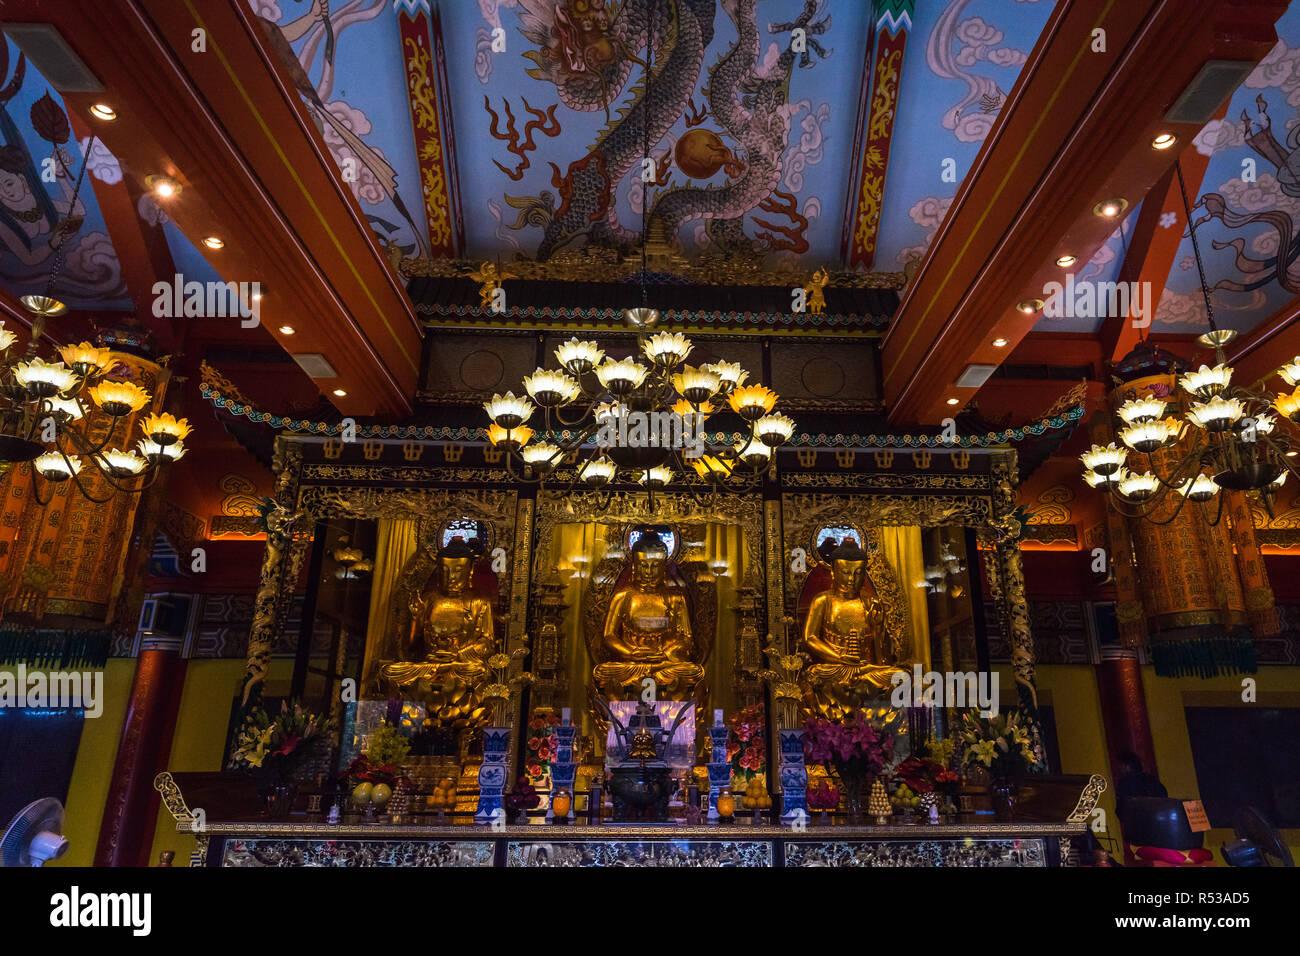 Golden Buddha statues and altar in the Main Shrine Hall of Po Lin Monastery. Hong Kong, Ngong Ping, Lantau Island, January 2018 Stock Photo